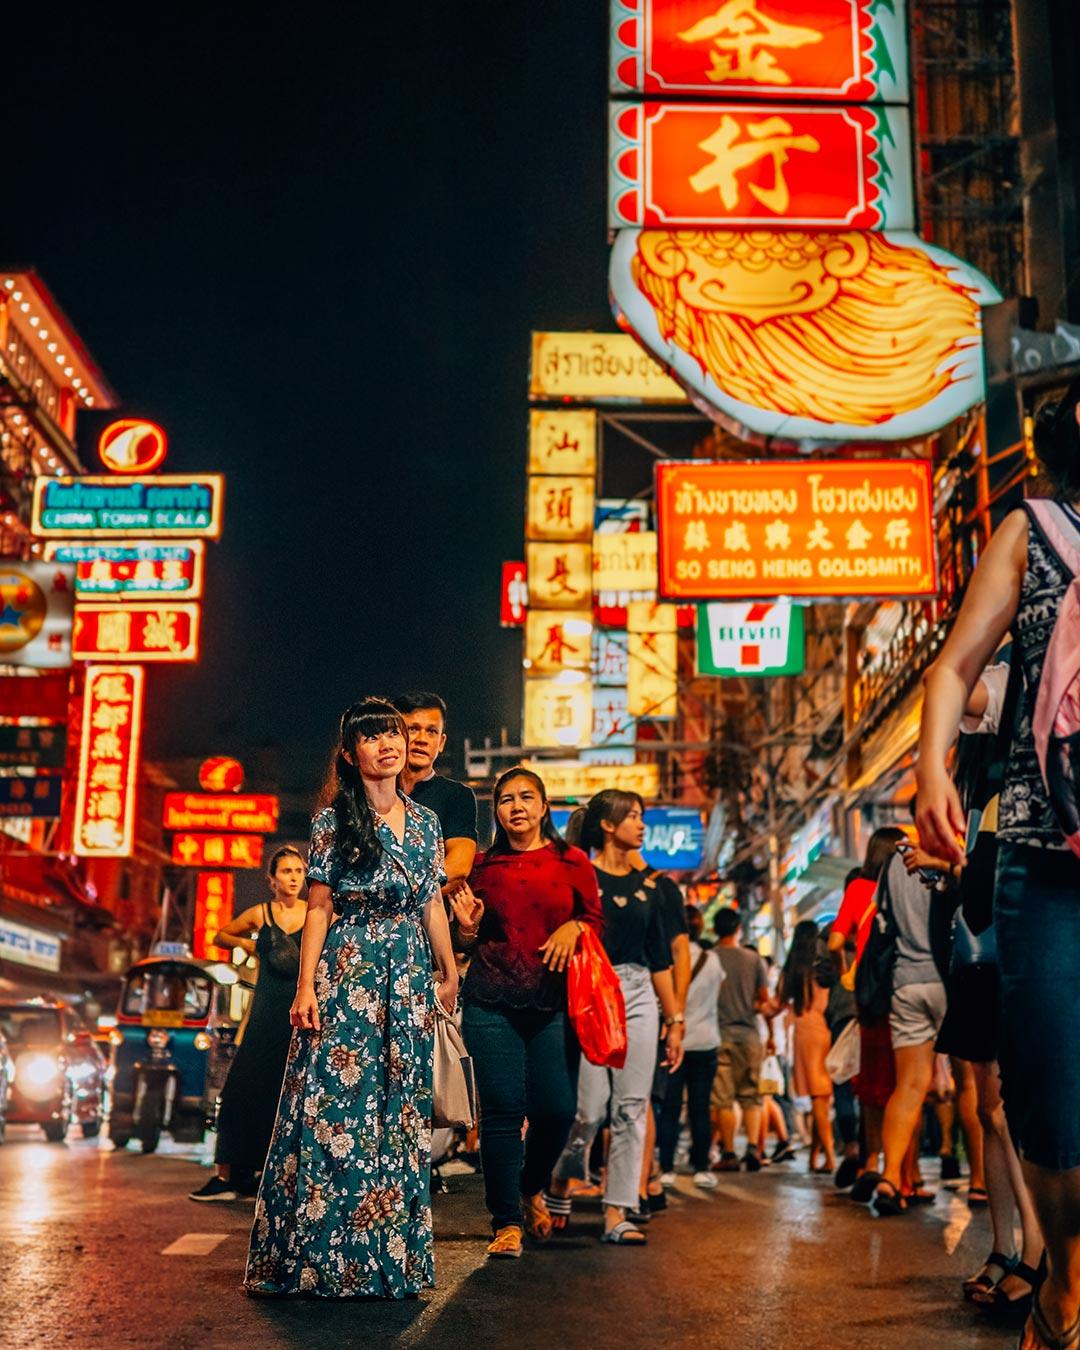 Chinatown Night Food Street in Bangkok